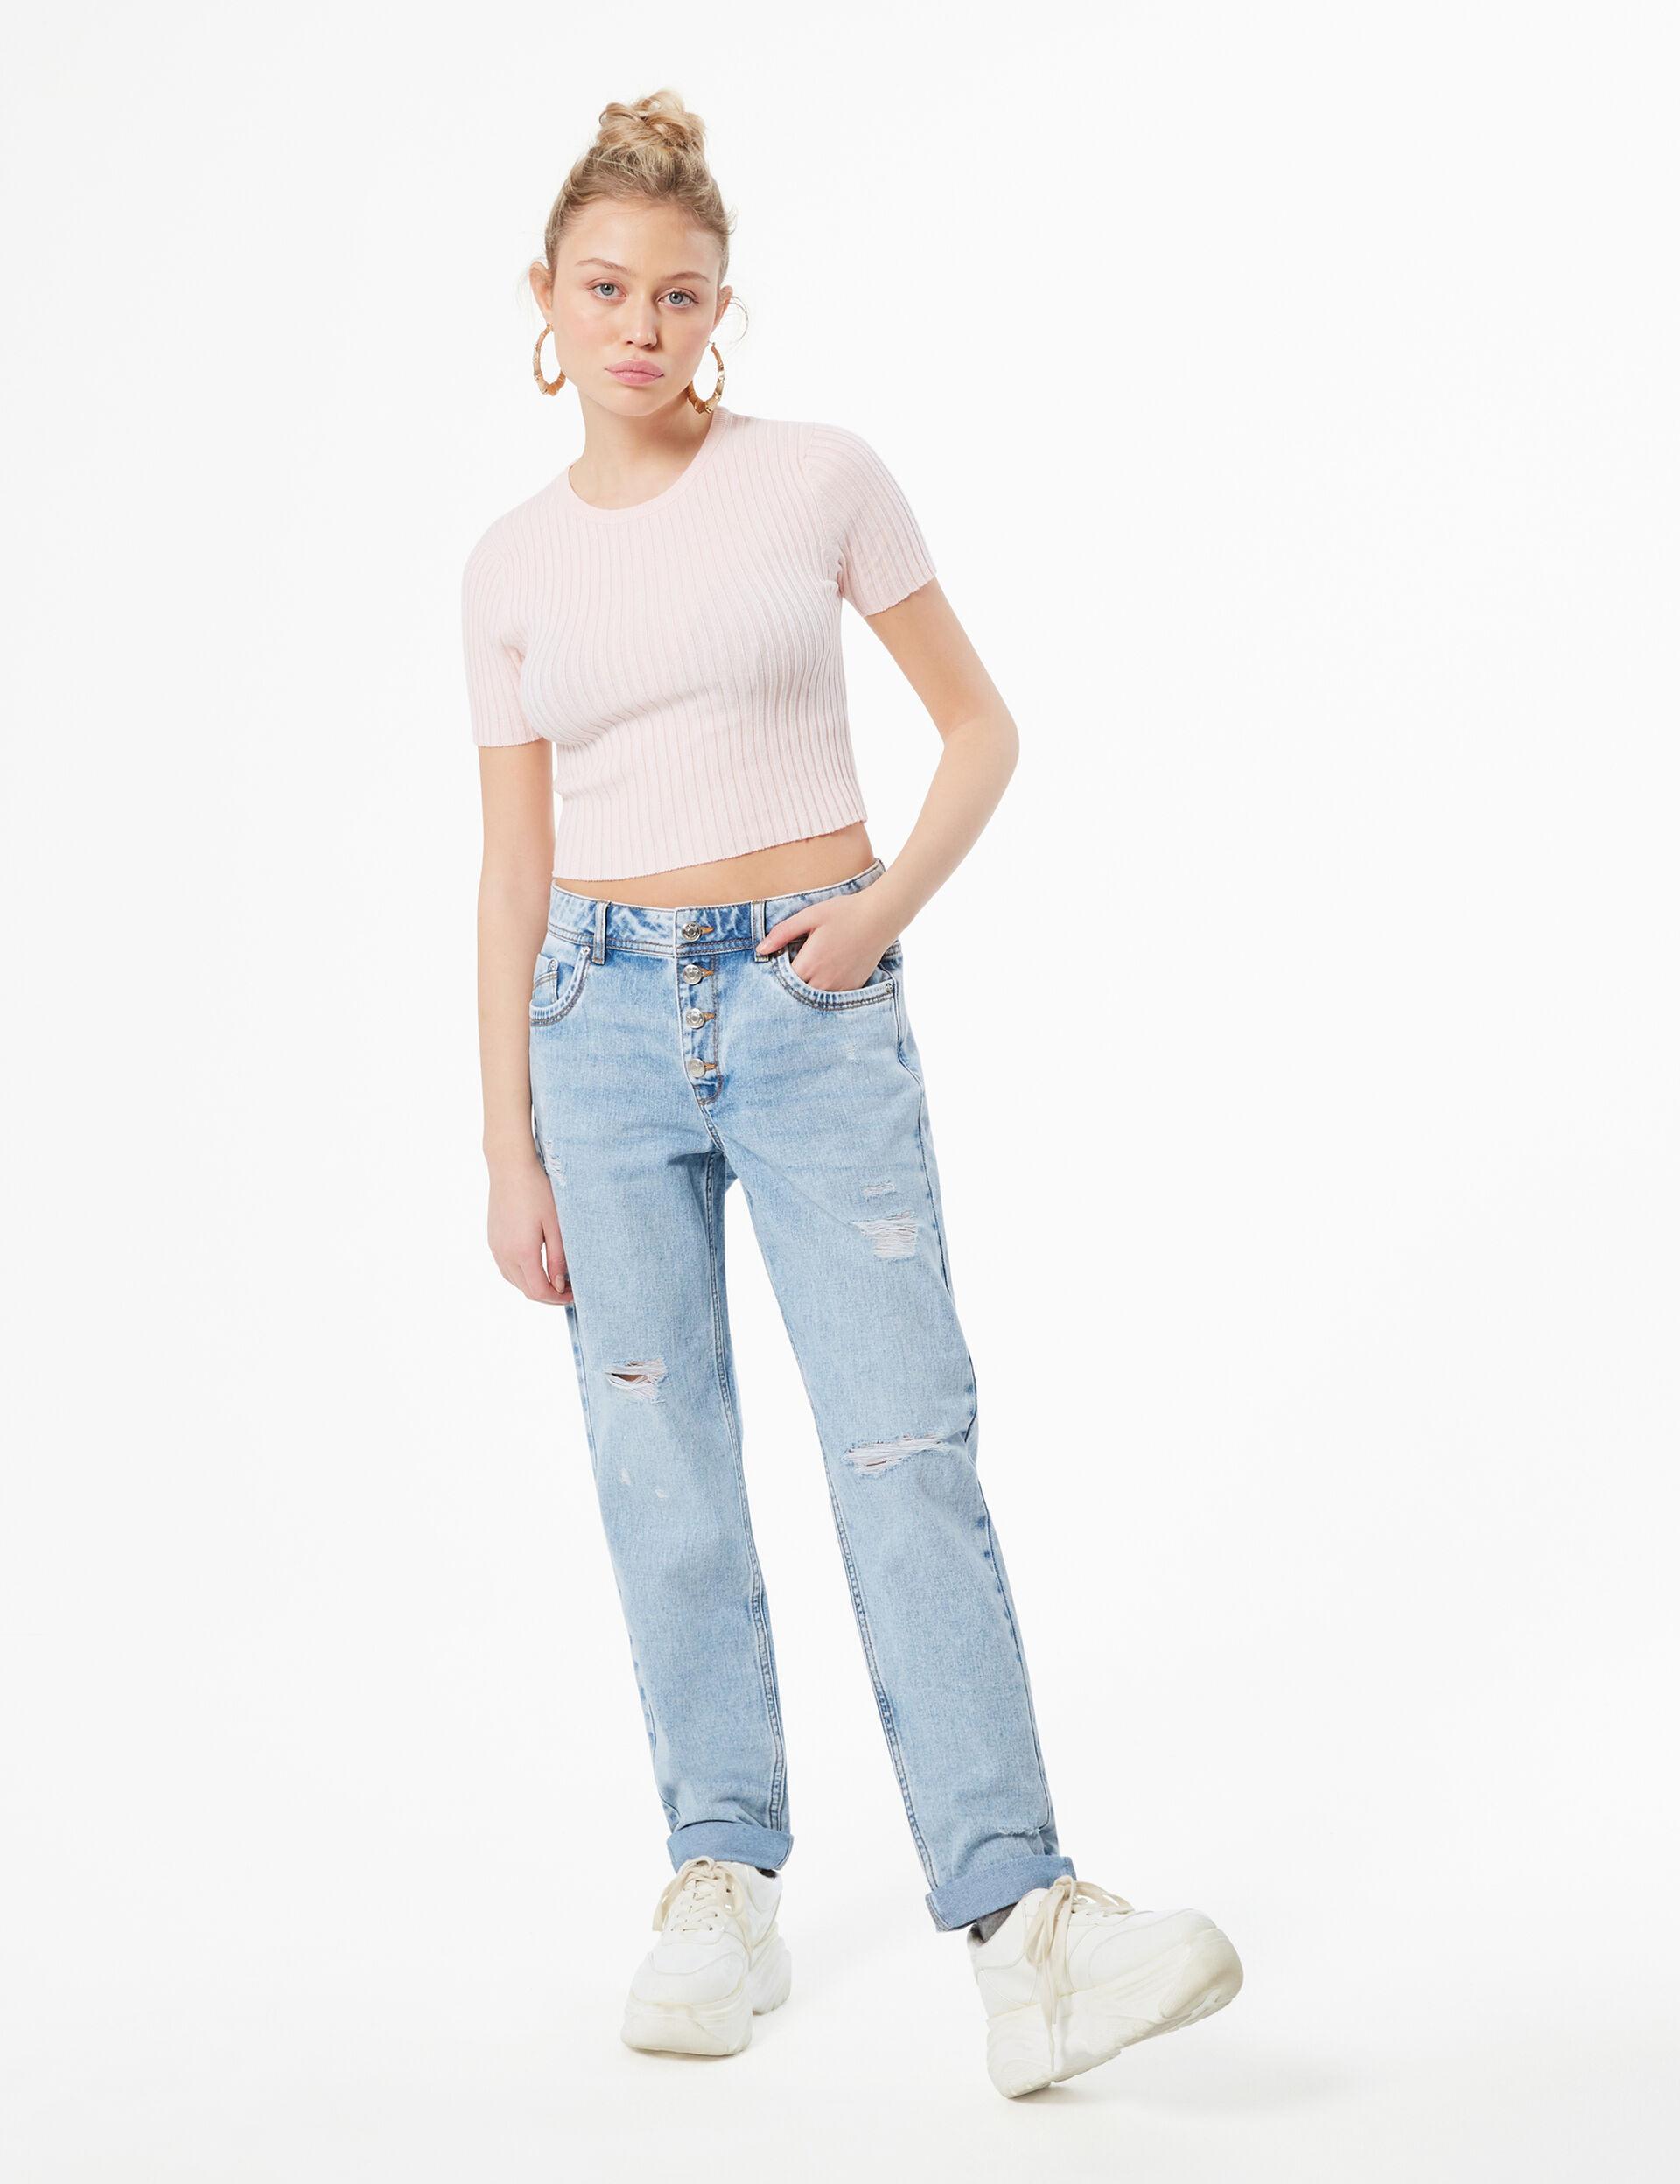 Distressed boyfriend jeans